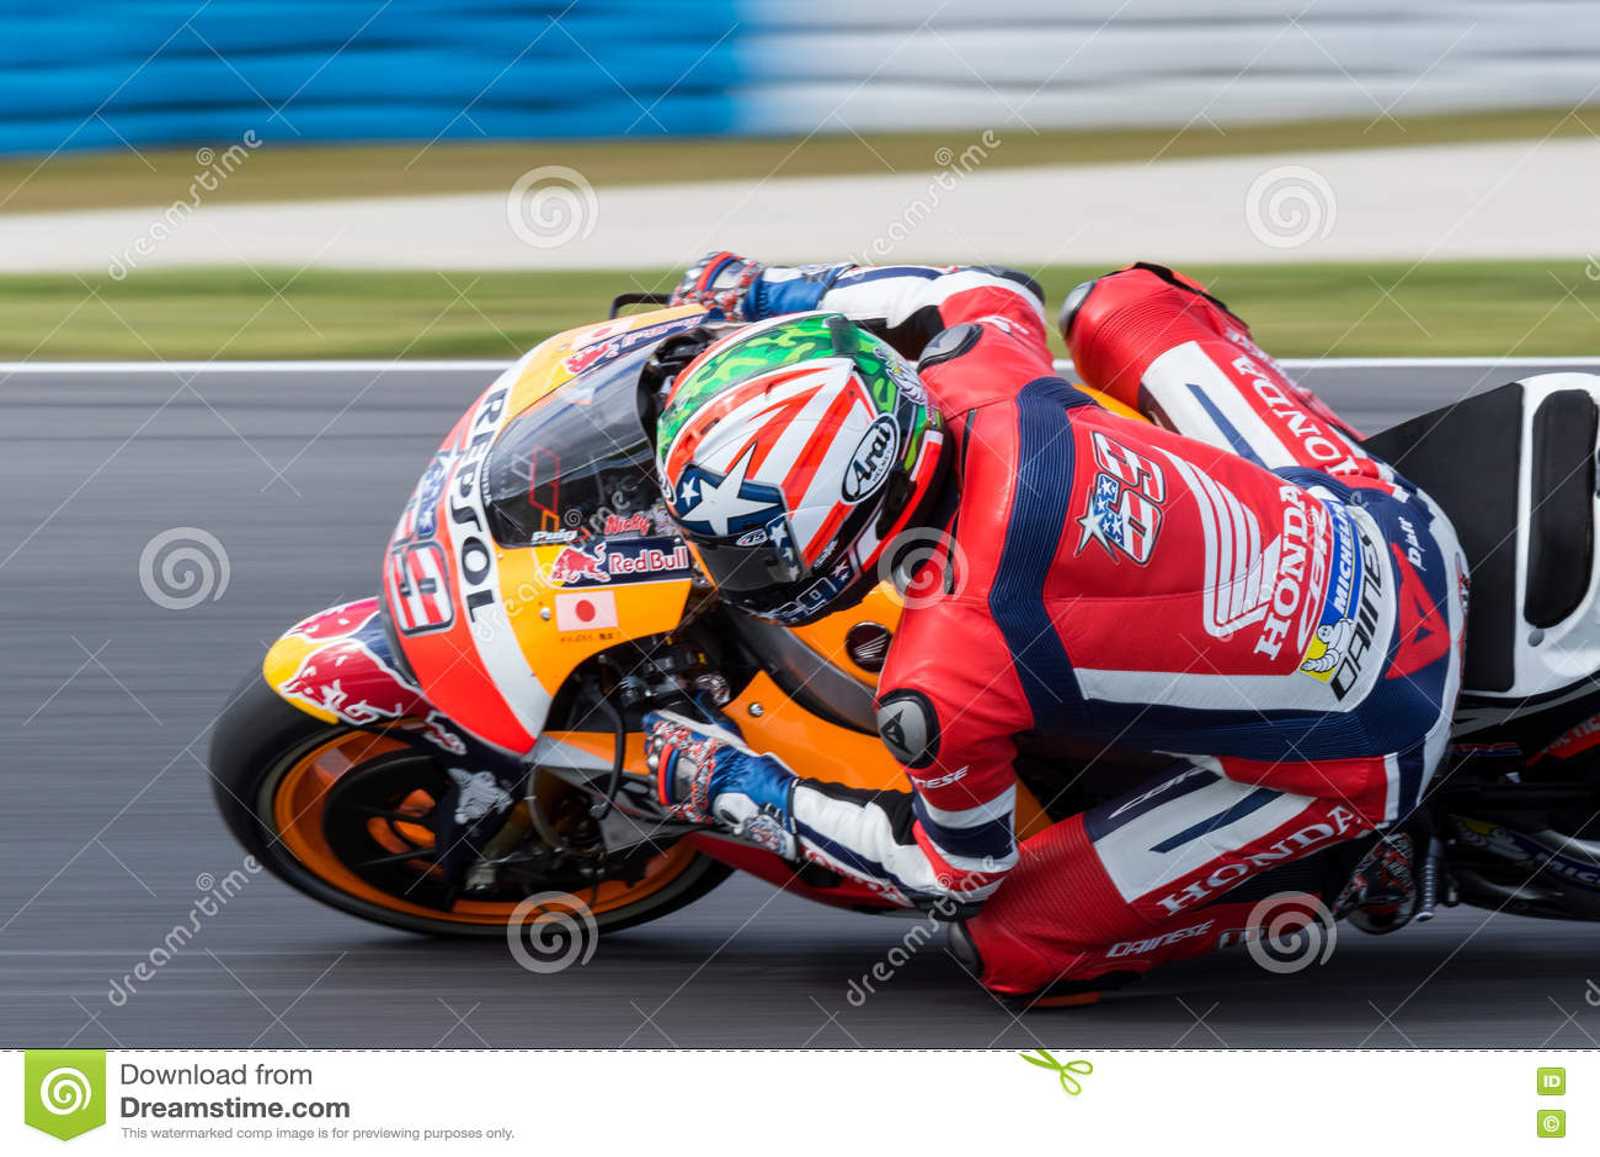 Michelin Australian Motorcycle Grand Prix 2016